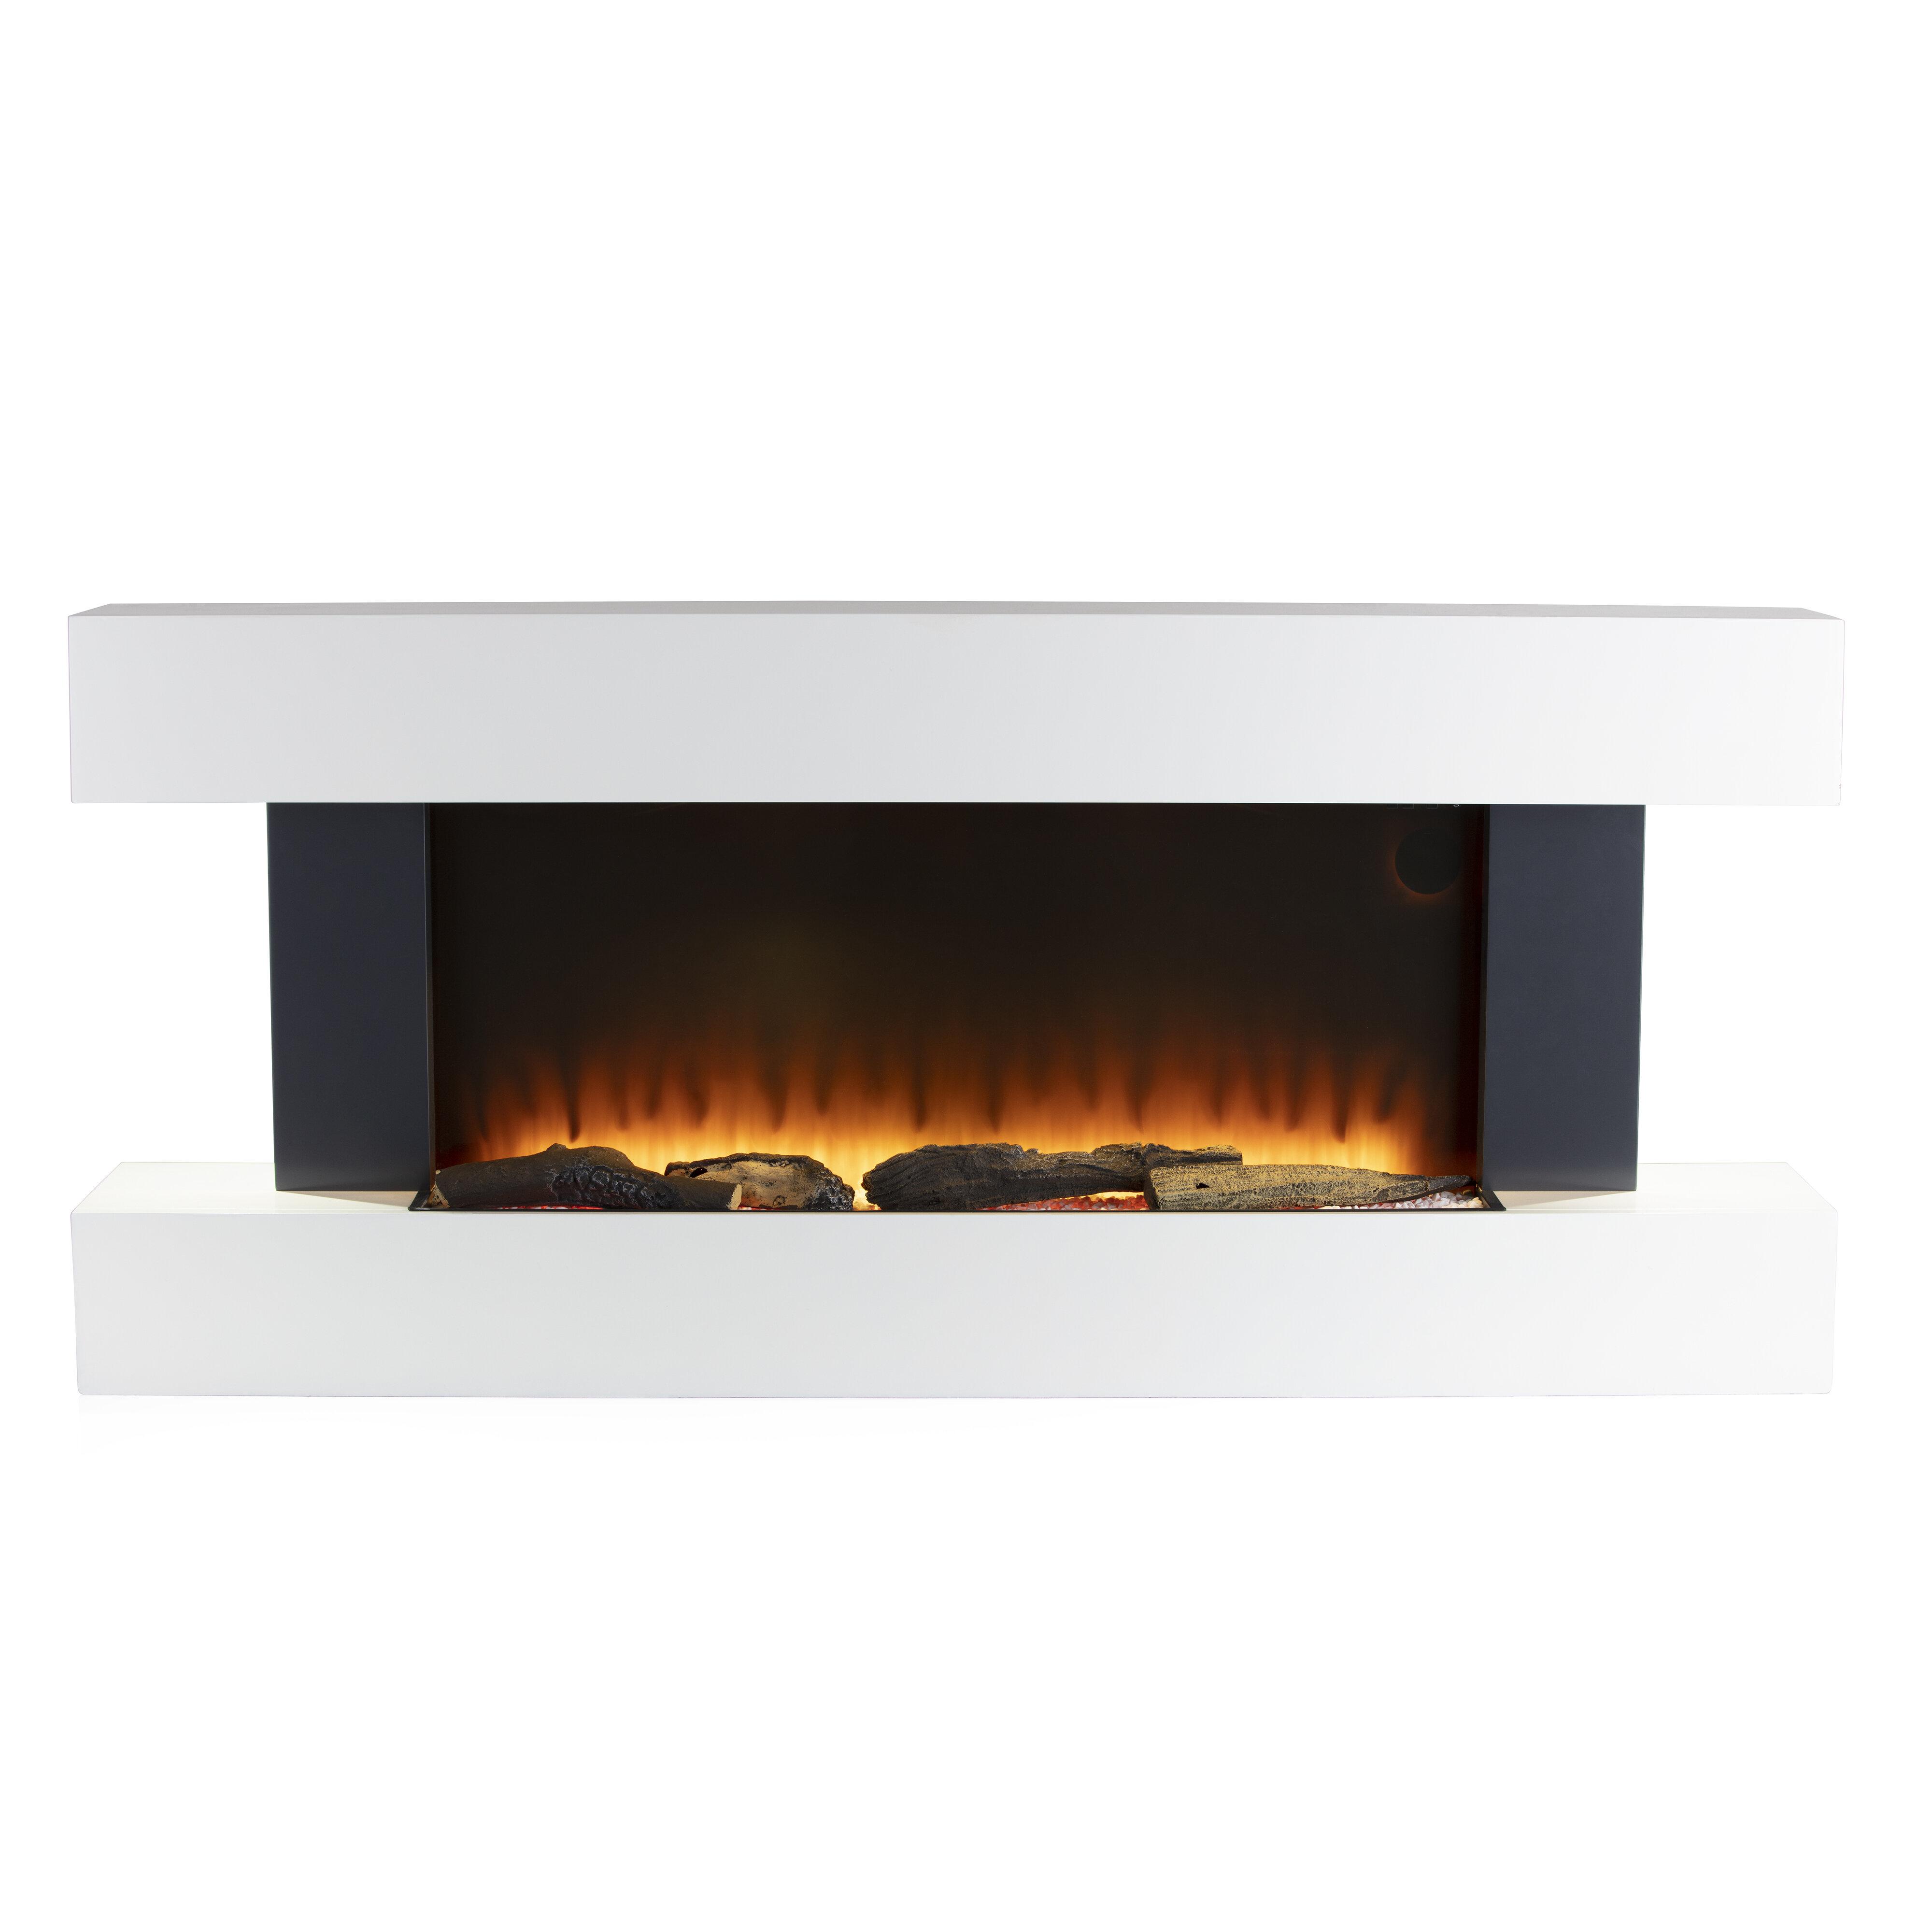 Warmlite Hingham Wall Mounted Fireplace Suite Reviews Wayfair